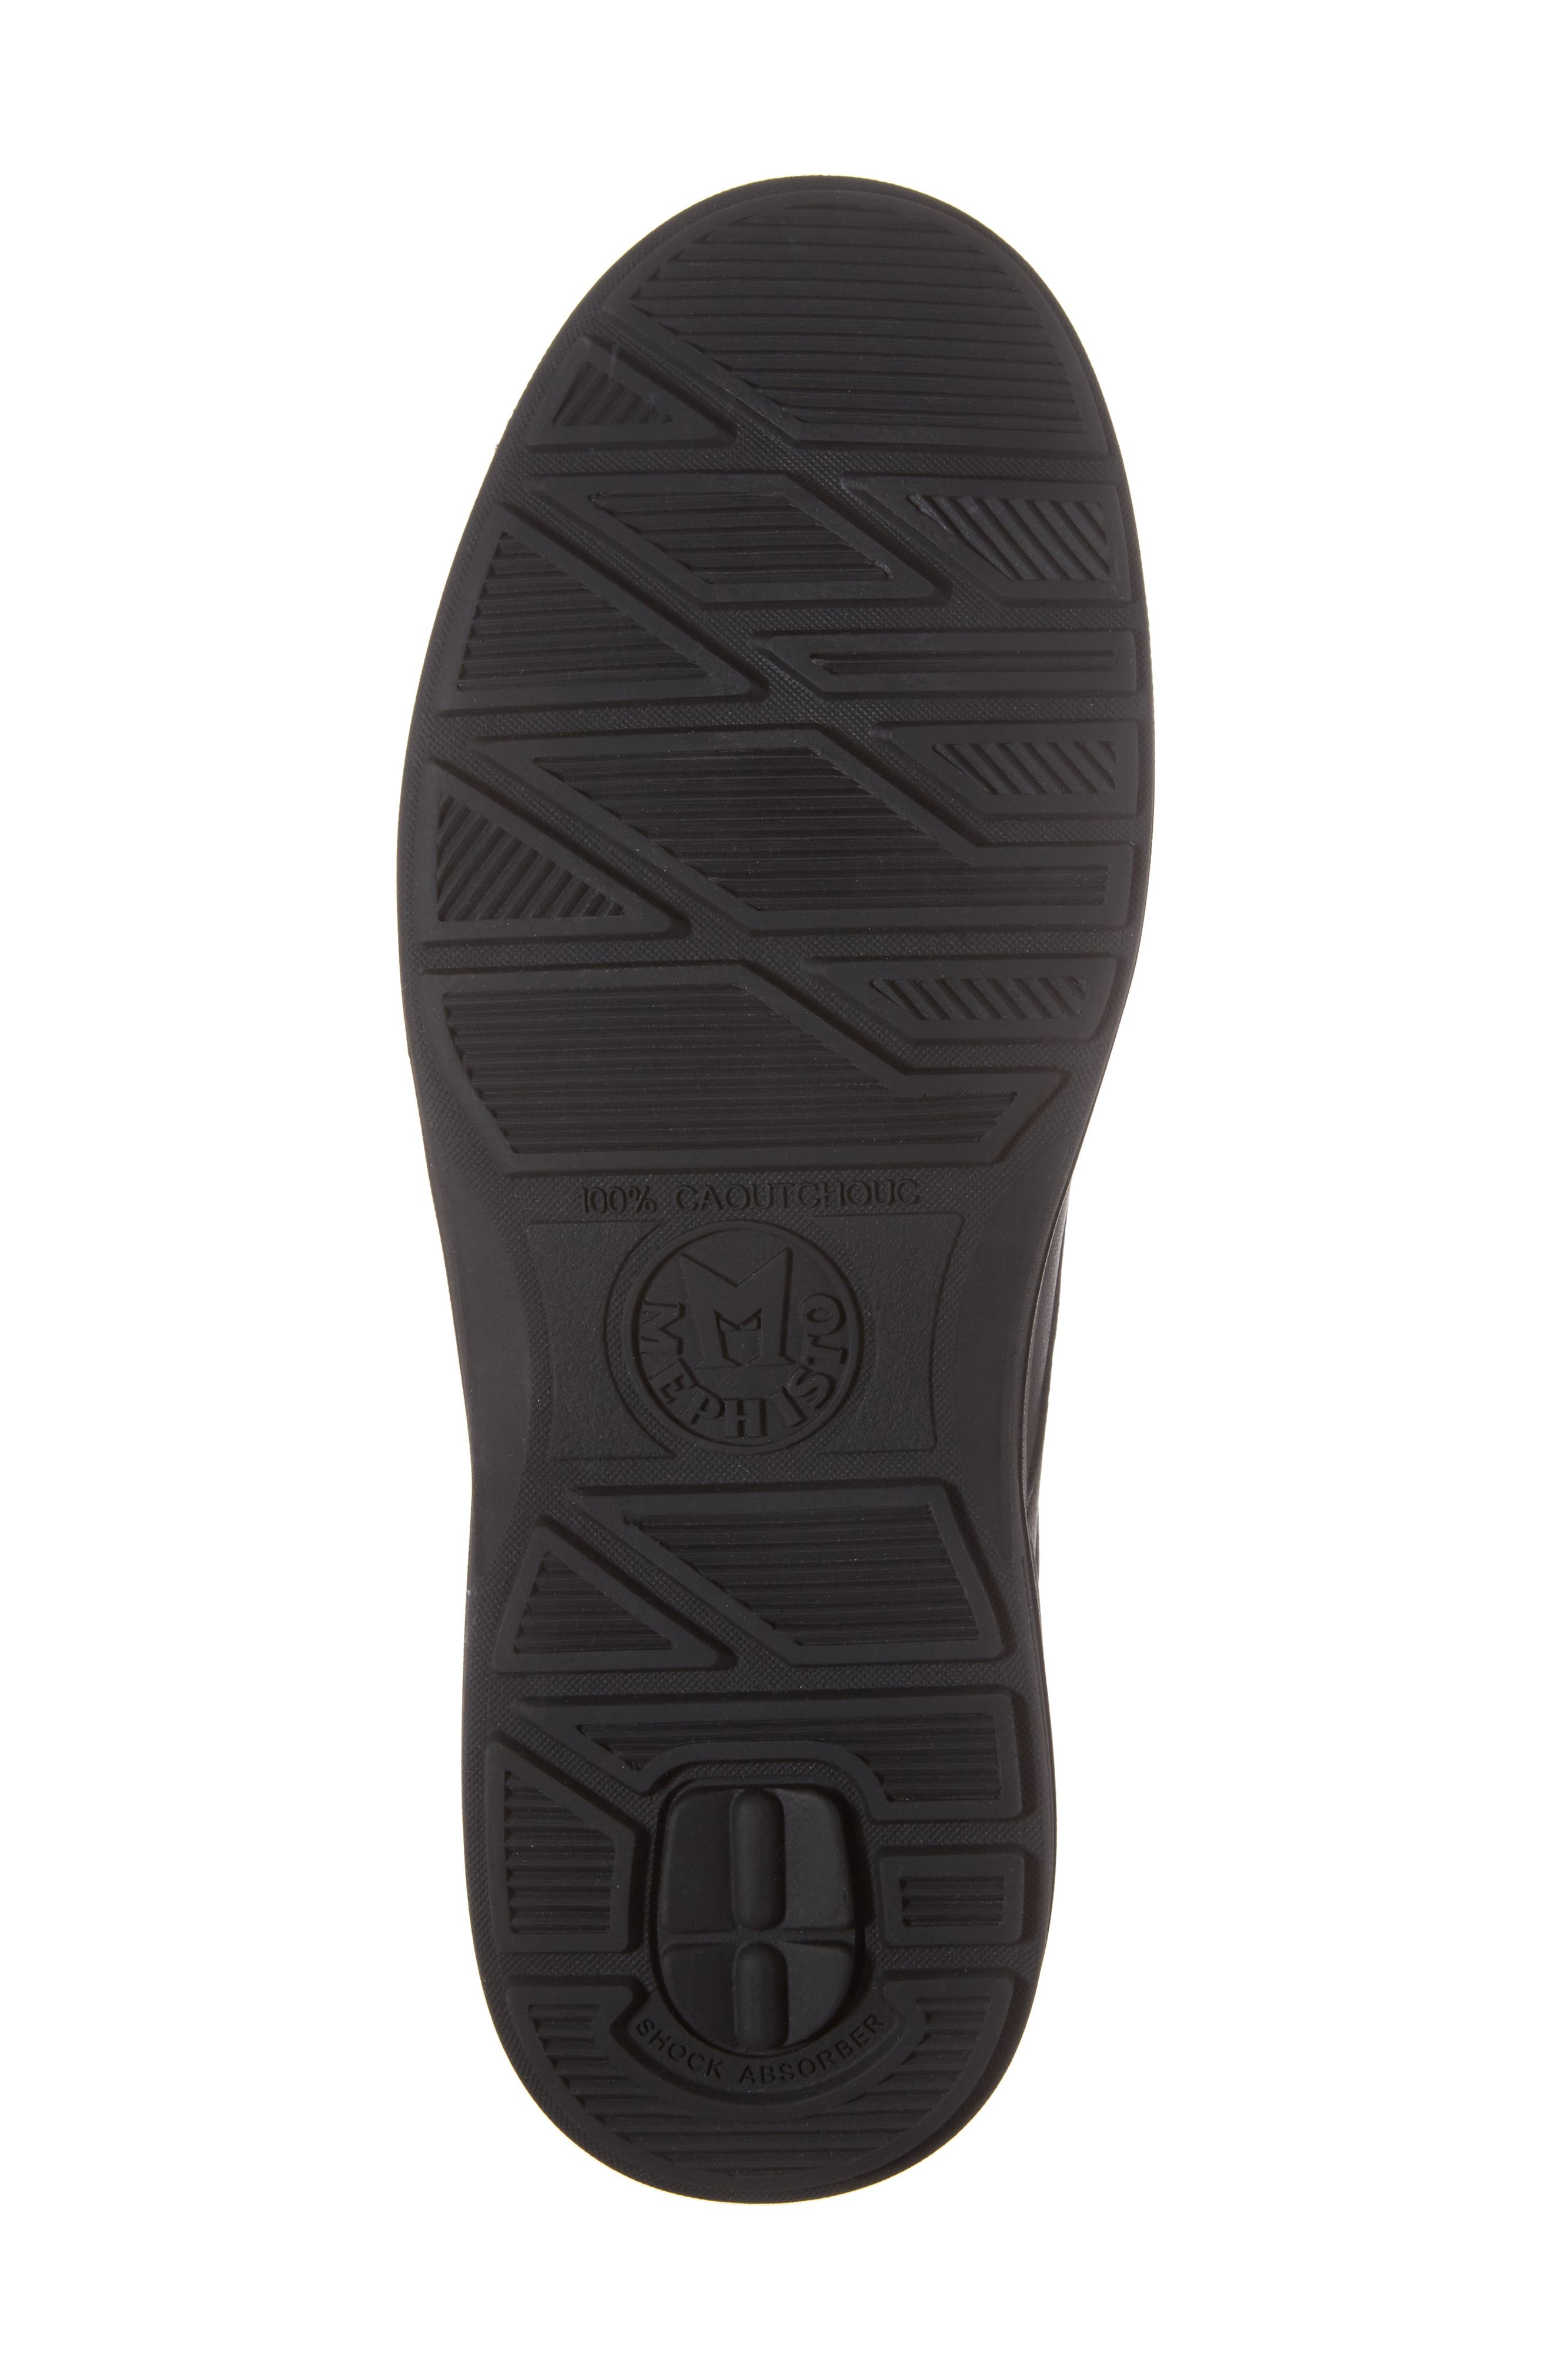 MEPHISTO, Douk HydroProtect Waterproof Moc Toe Derby, Alternate thumbnail 6, color, BLACK CALFSKIN